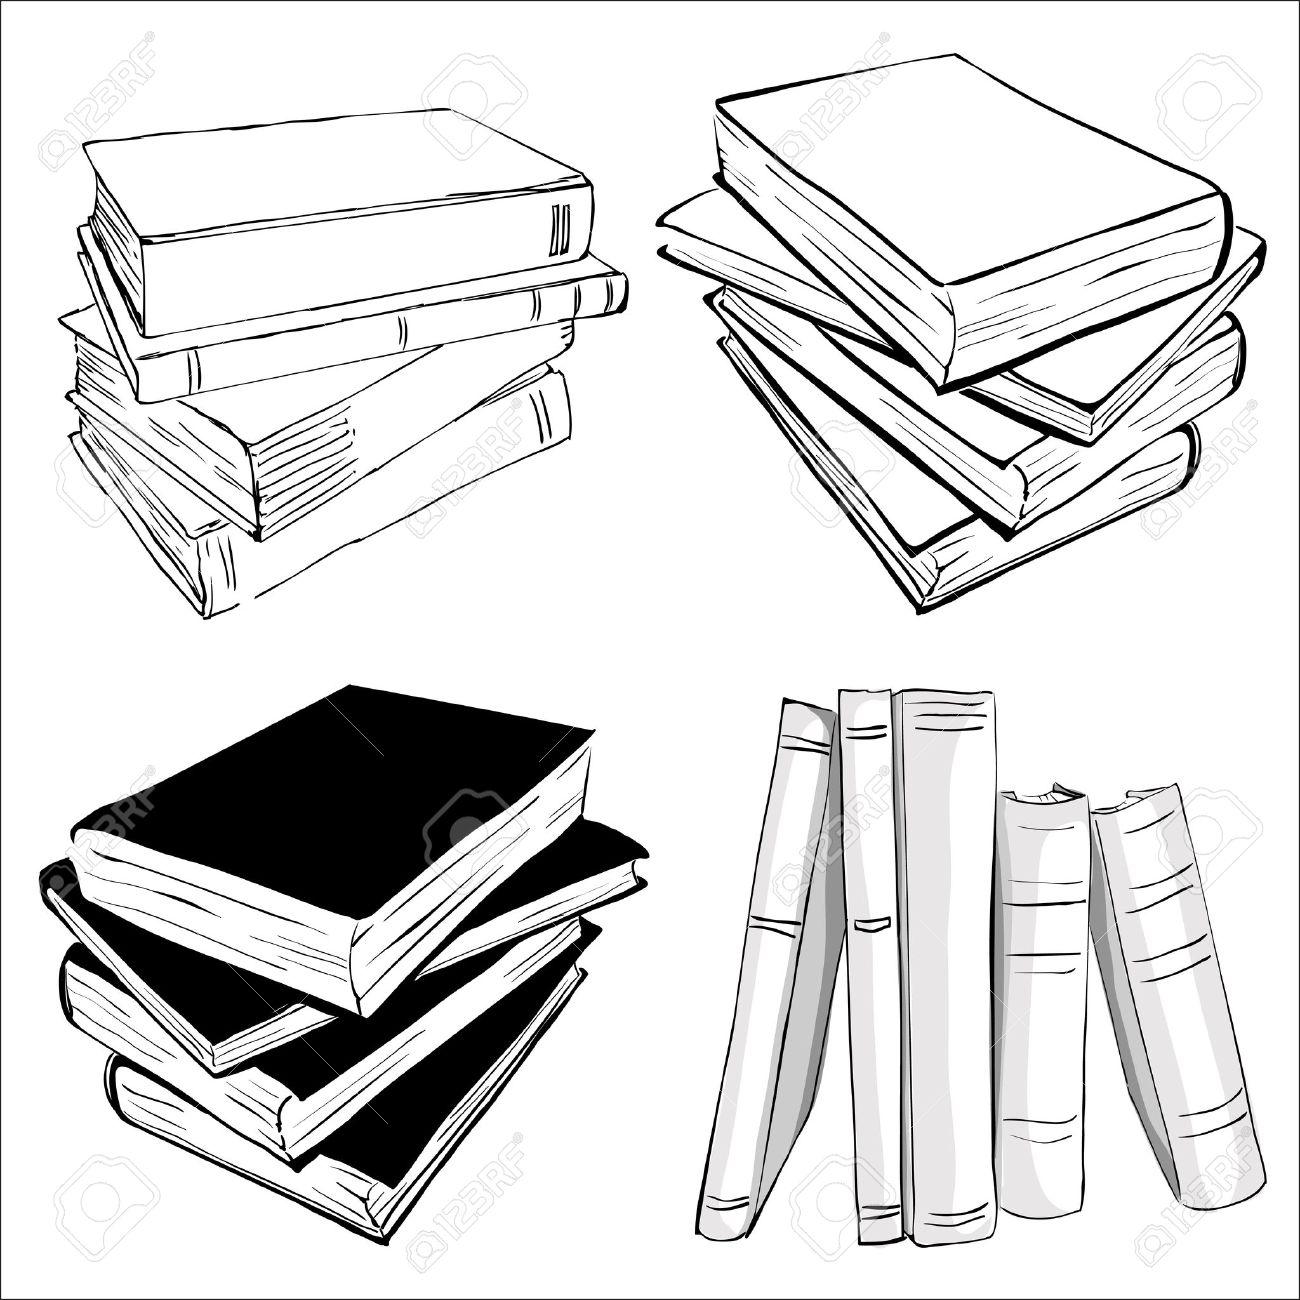 Books Drawing At Getdrawings